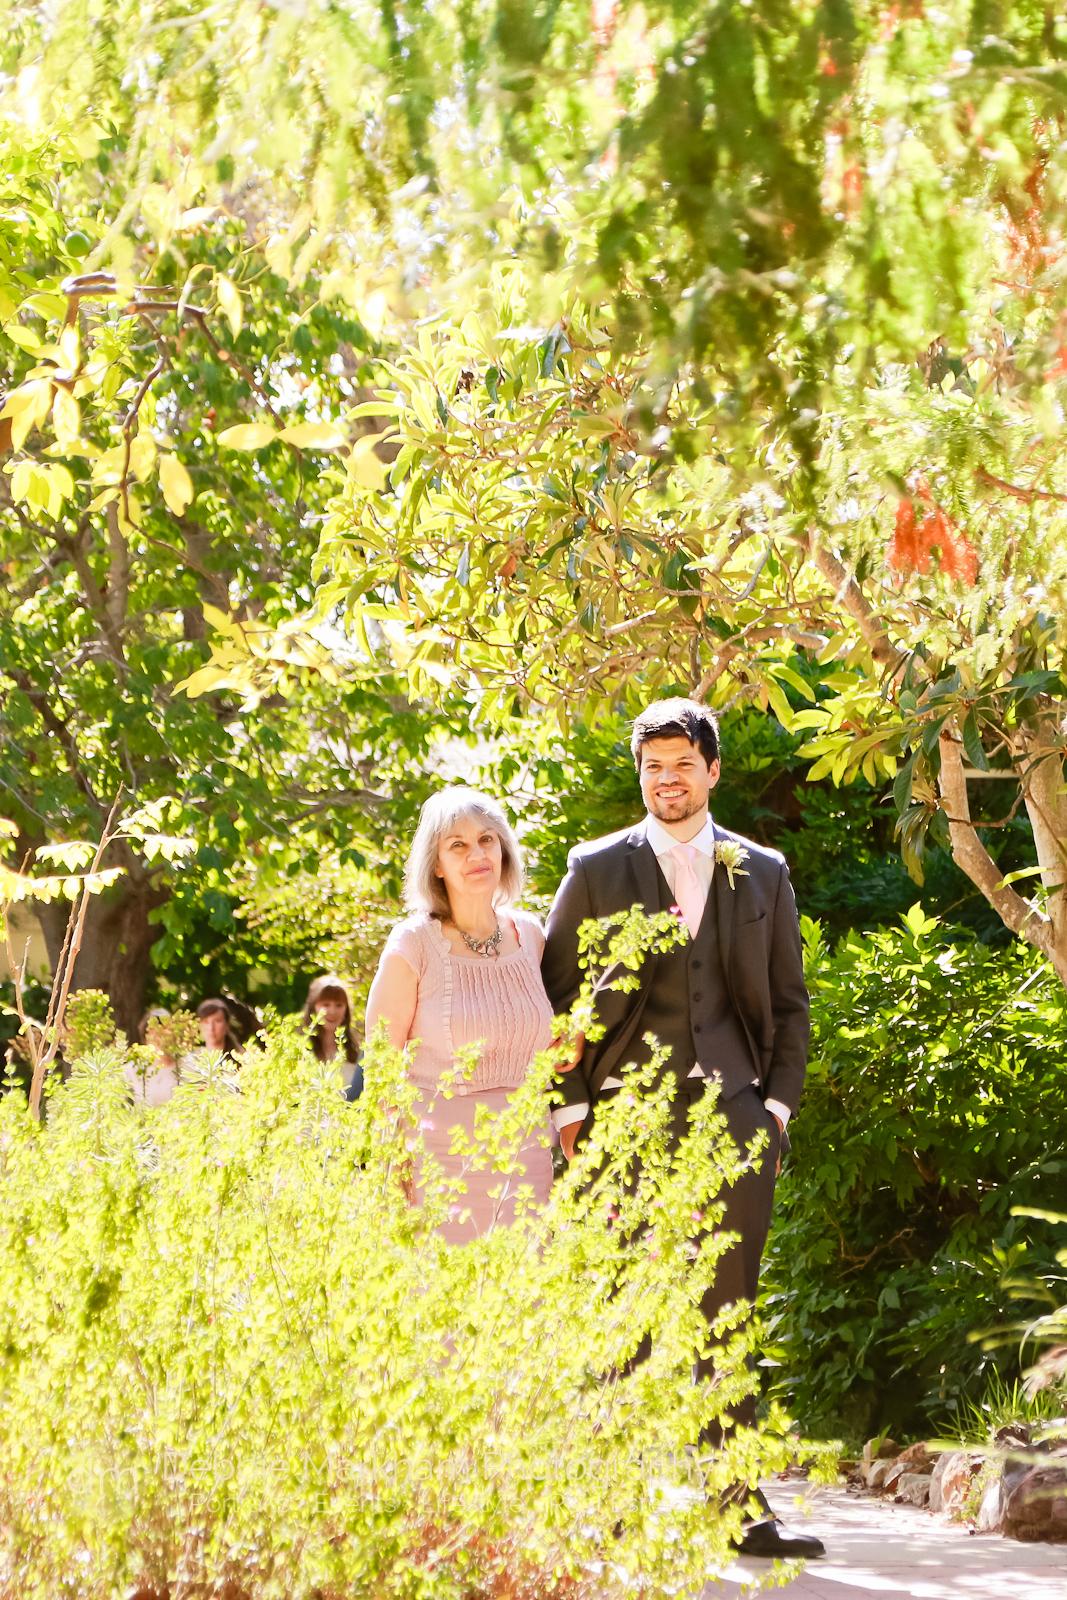 Debbie Markham Photography+Dalliedet House+San Luis Obispo+Garden Wedding+Fall Season-5228